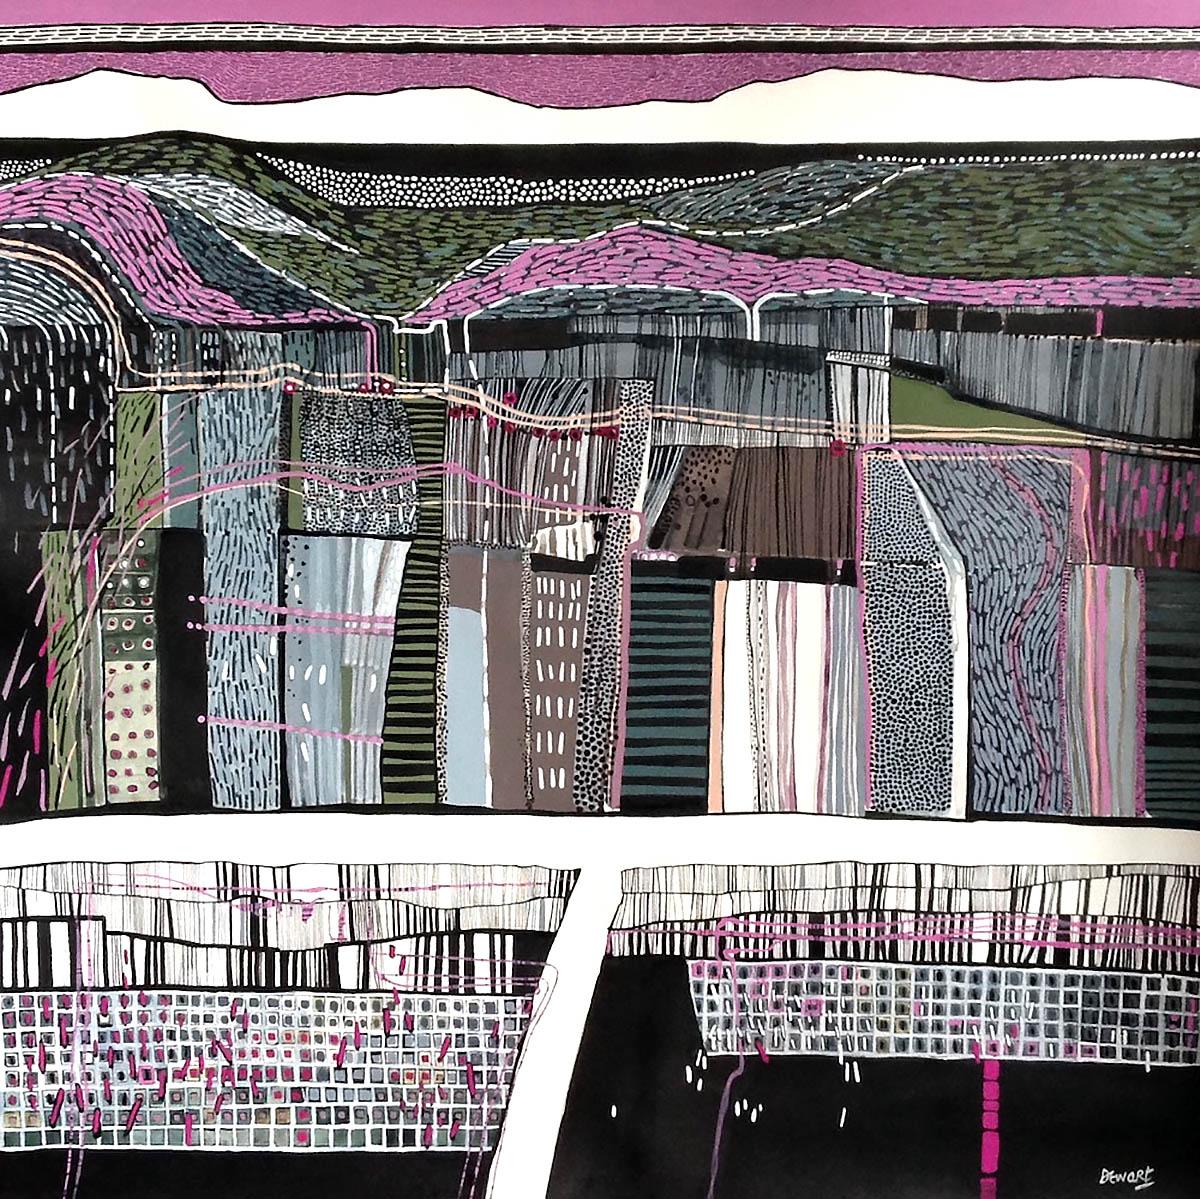 Carol Dewart, 'A Green Hill Far Away', gouache